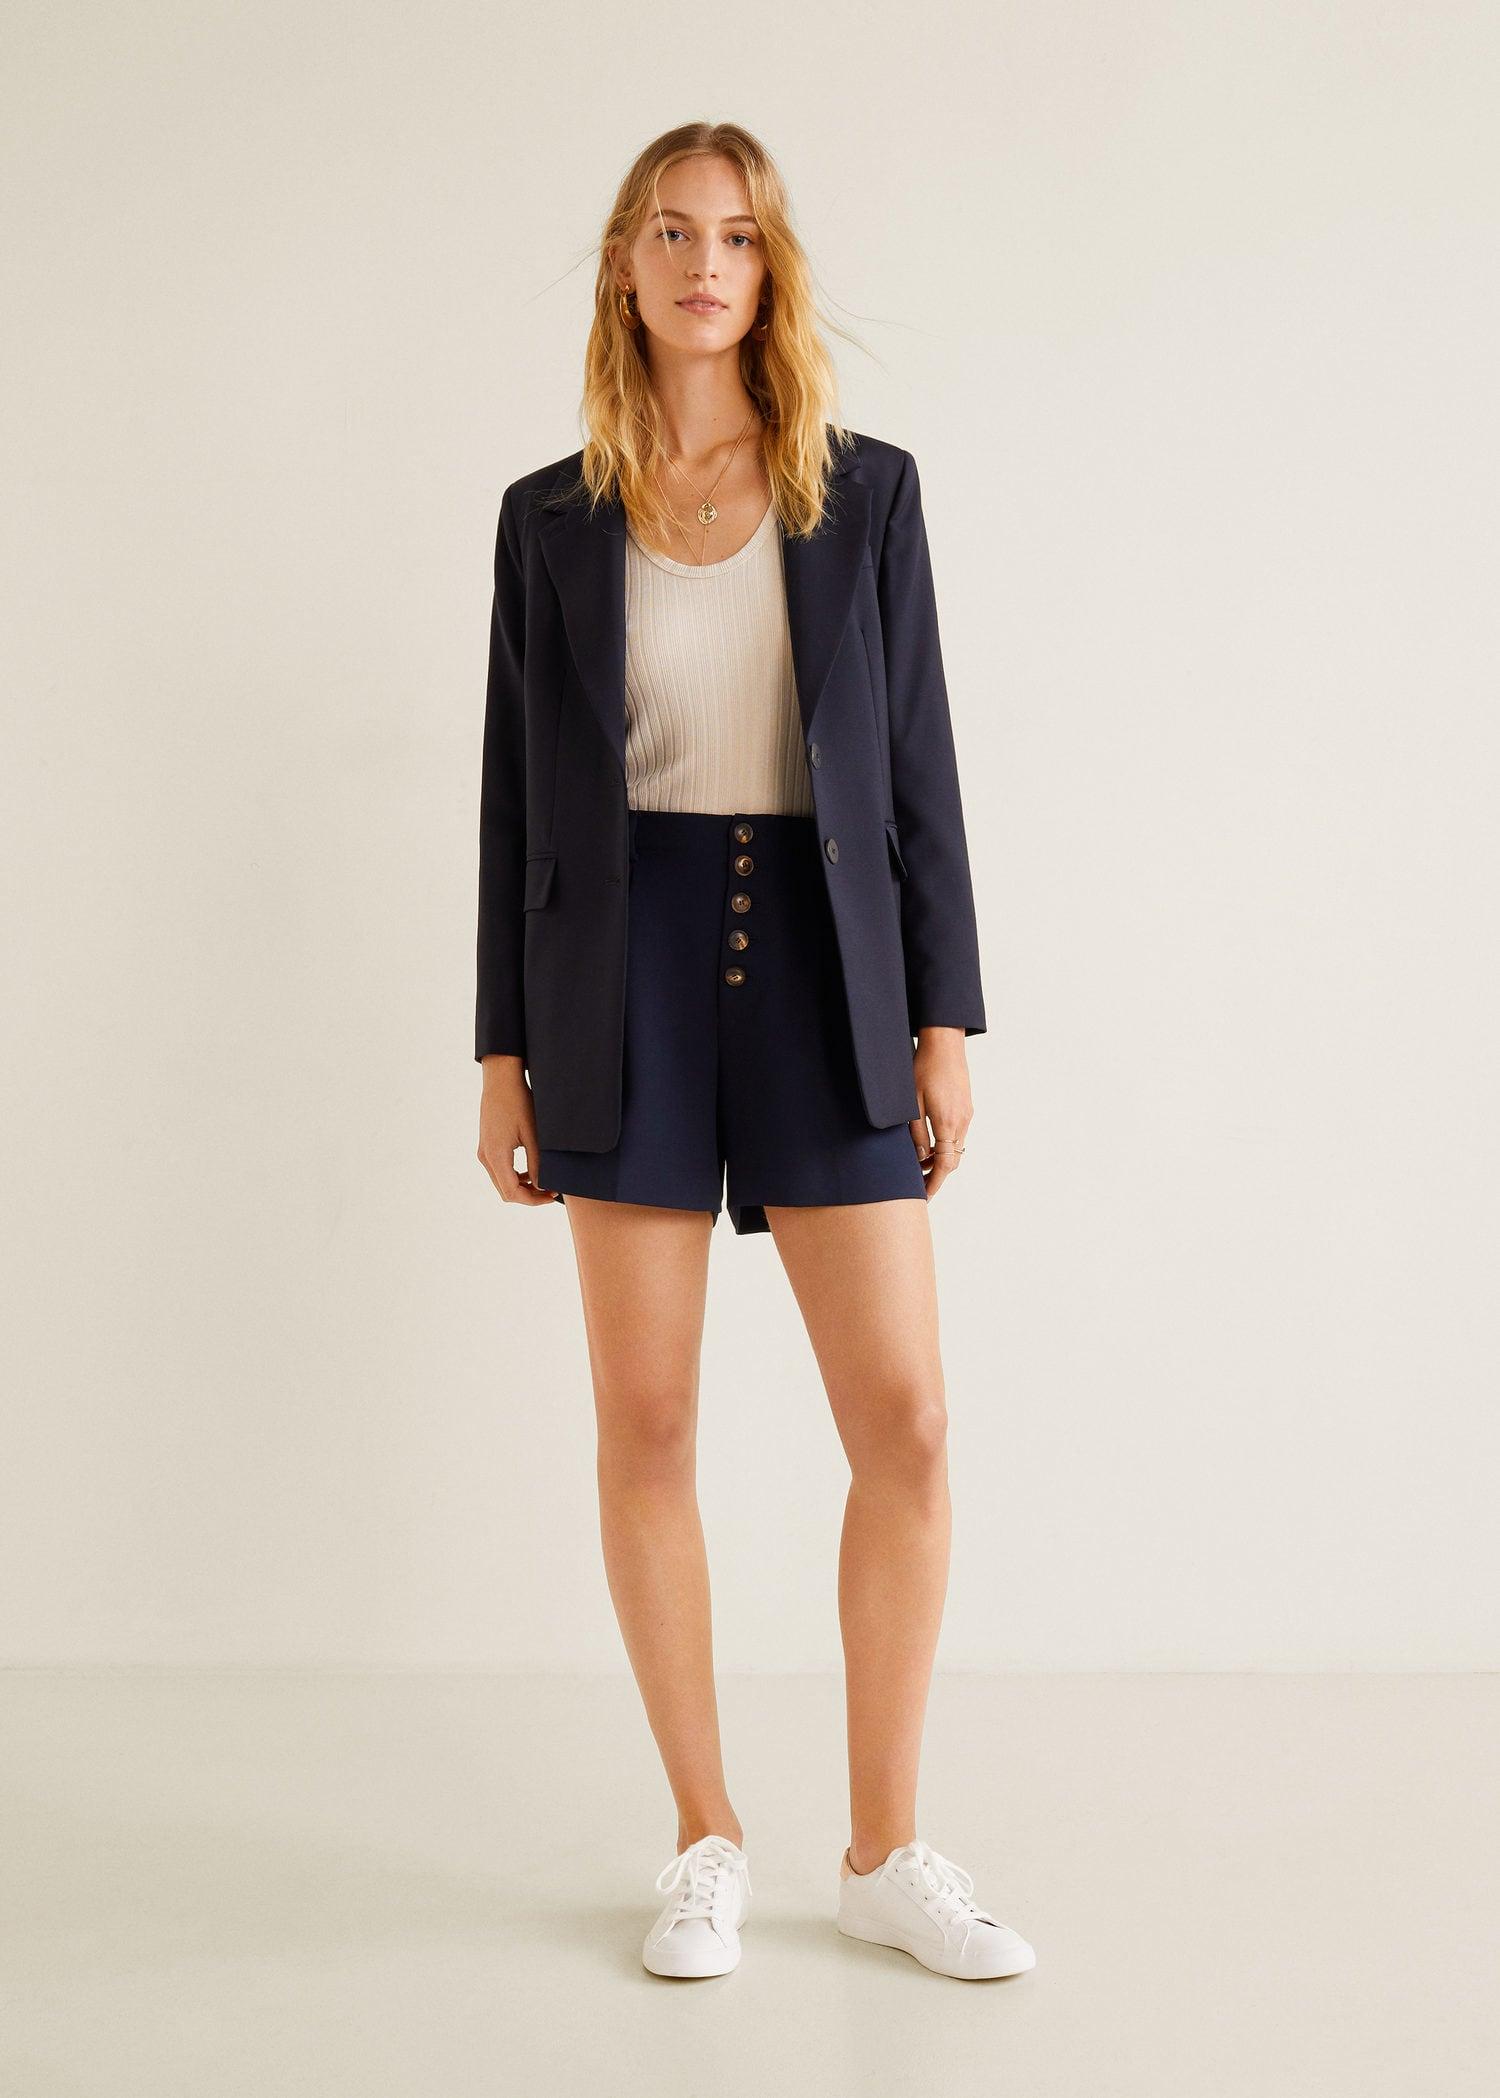 4156da5f9ef8 Mango Fall 2018 Collection Has Cute Workwear For Cheap